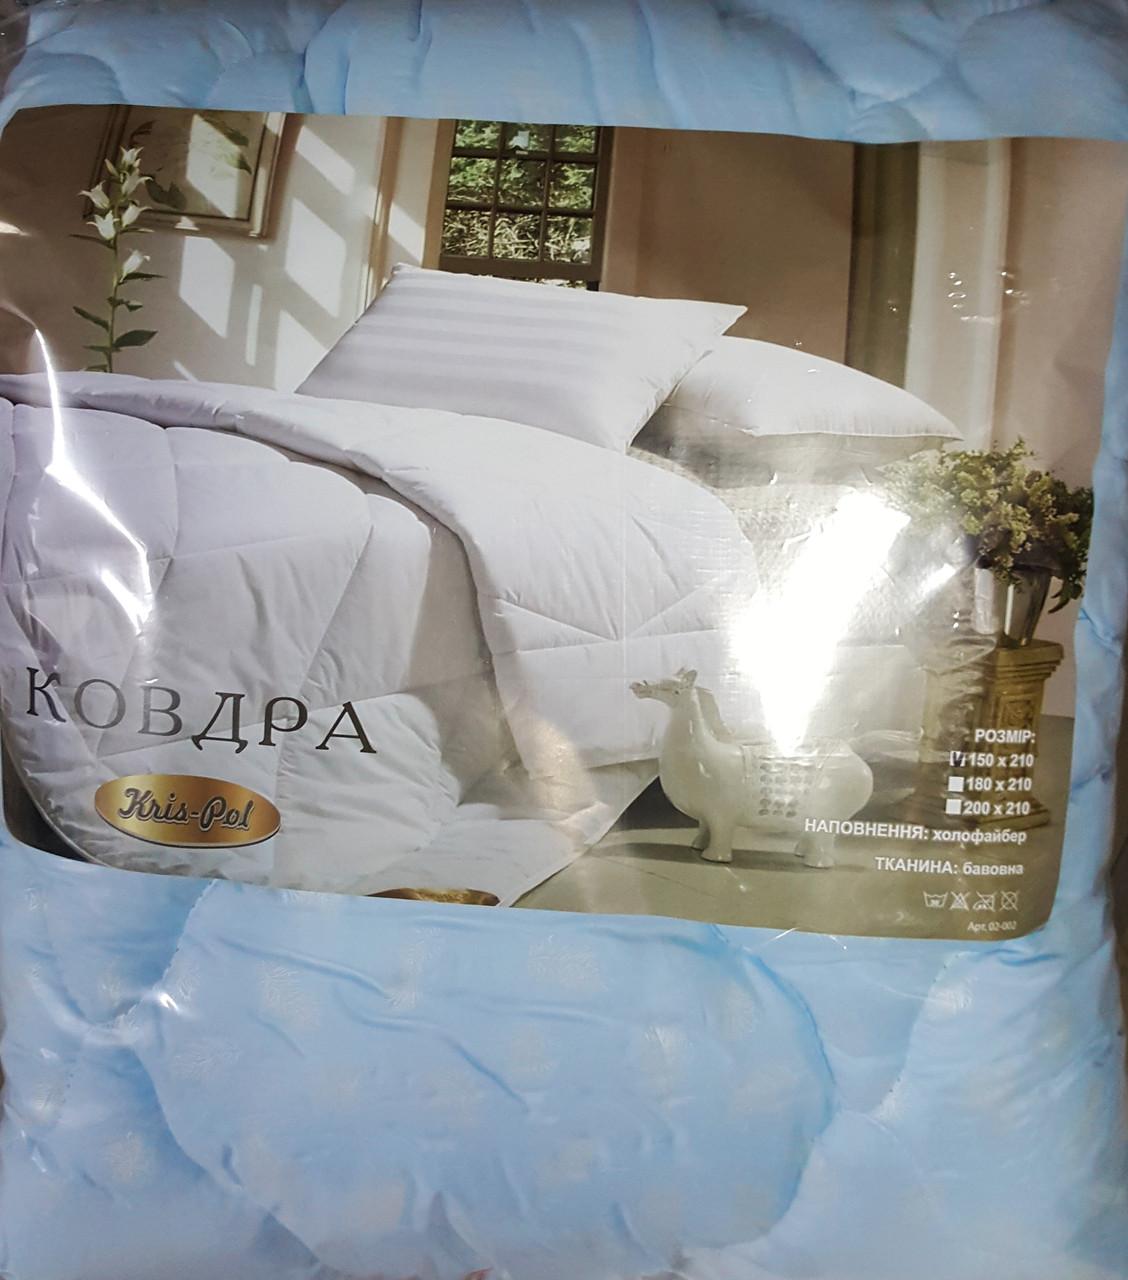 Одеяло двуспальное евроразмер микрофибра холофайбер 200*210 евро (5043) TM KRISPOL Украина